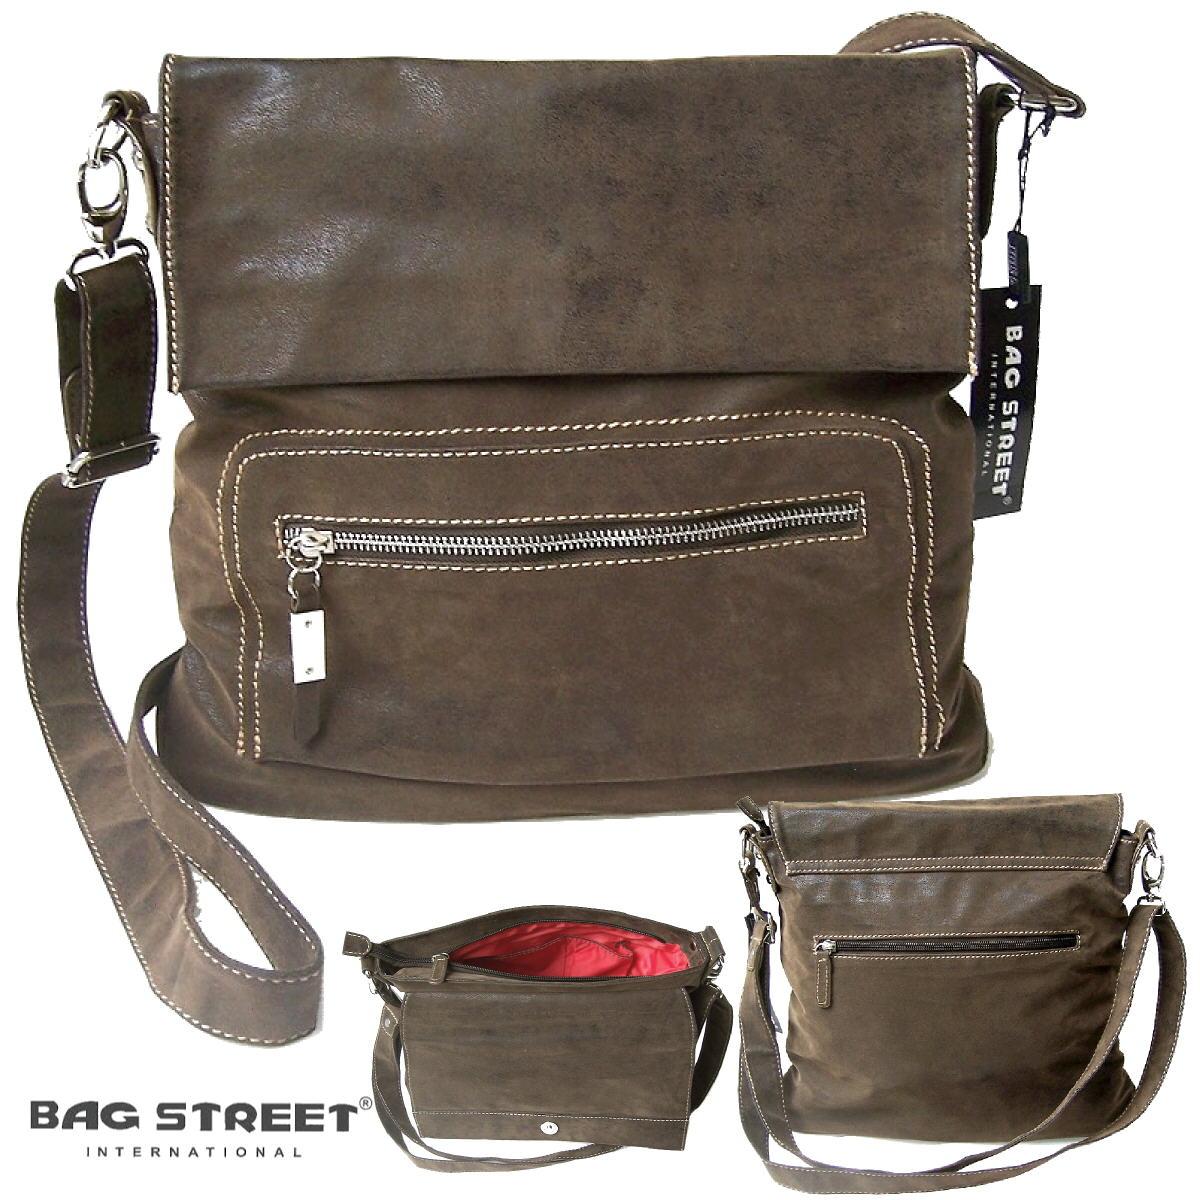 Tasche Umhängetasche Handtasche Bag Street braun Leder-look Ta812